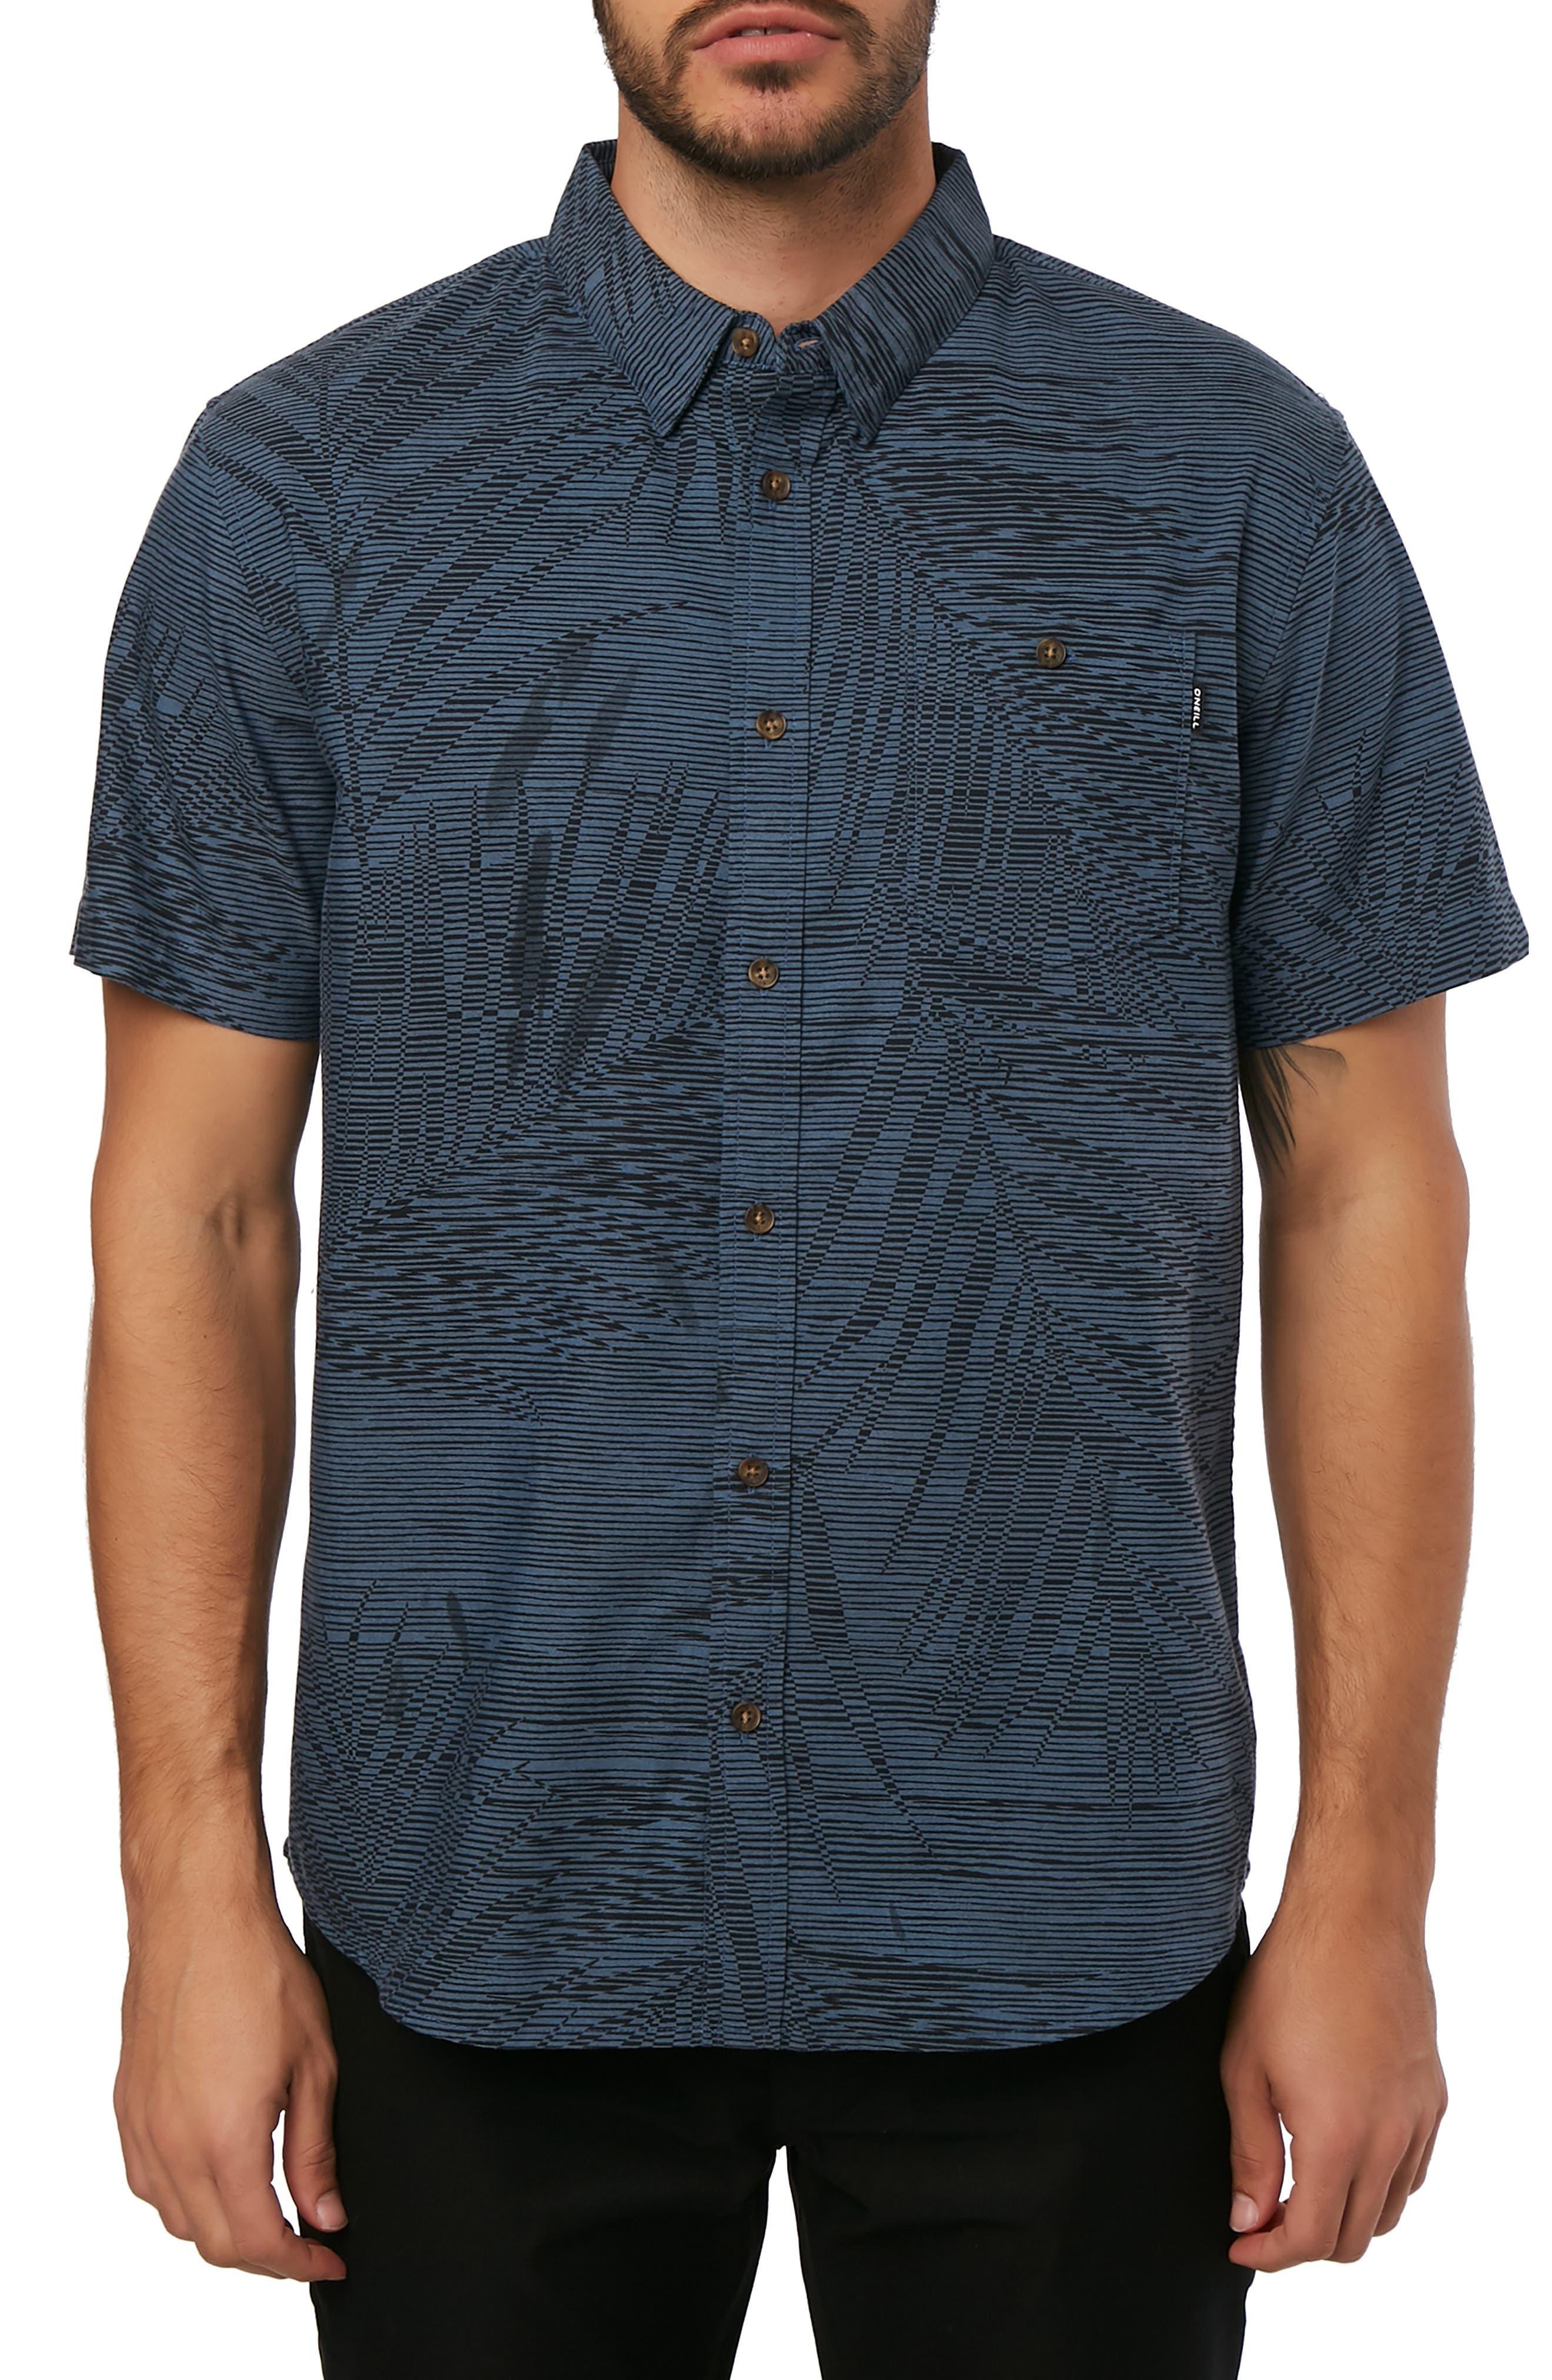 Fronzarelli Woven Shirt,                         Main,                         color, DARK BLUE